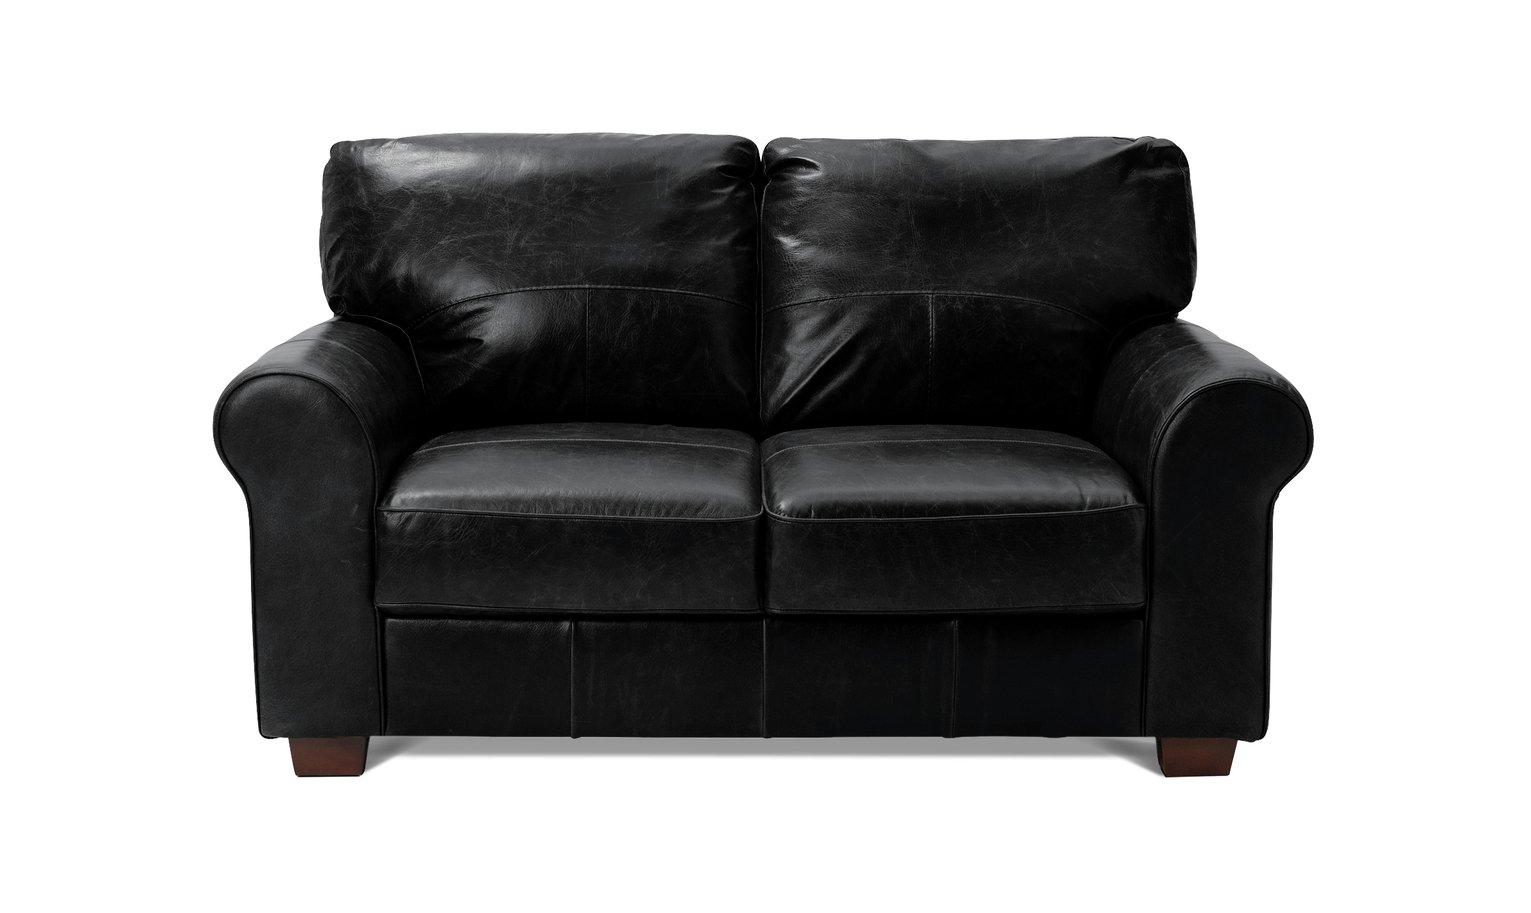 Buy Argos Home Salisbury 2 Seater Leather Sofa - Black ...